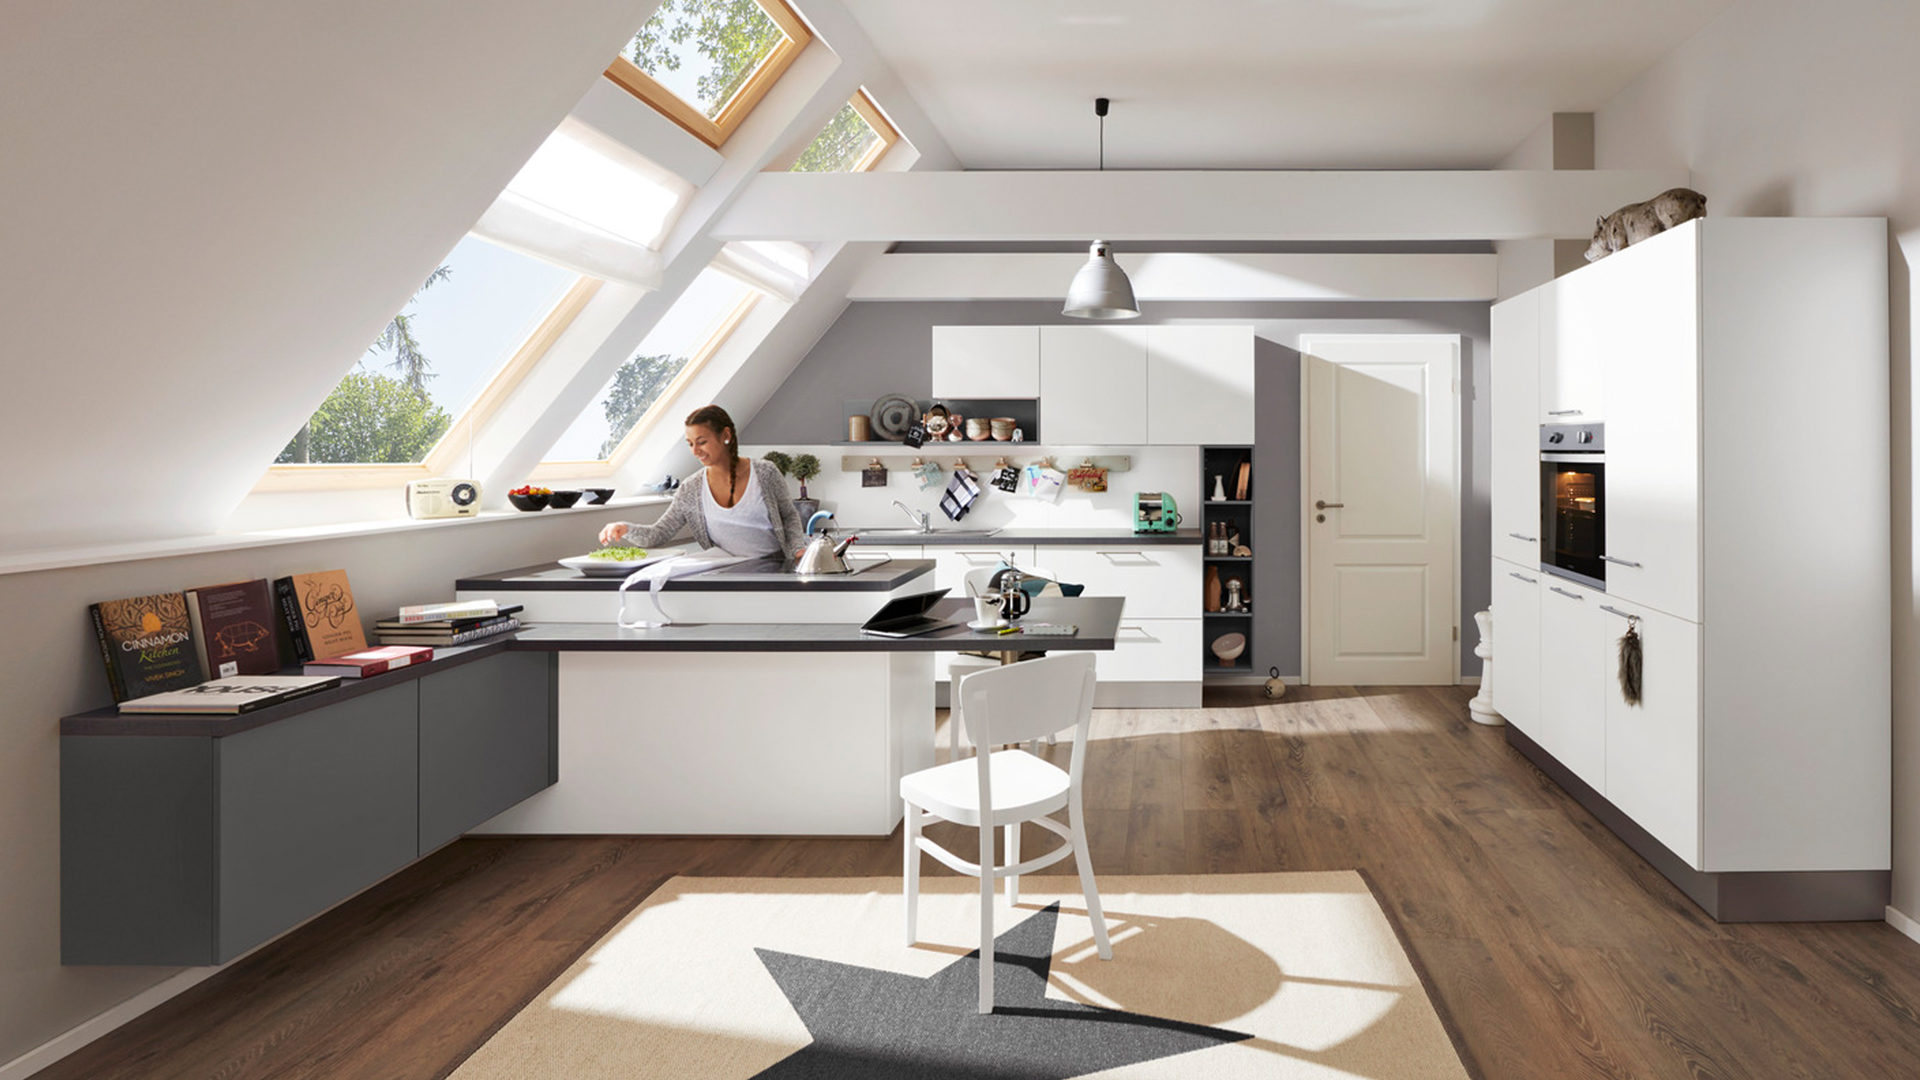 Fein Reddy Küchen Fellbach Fotos - Innenarchitektur Kollektion ...